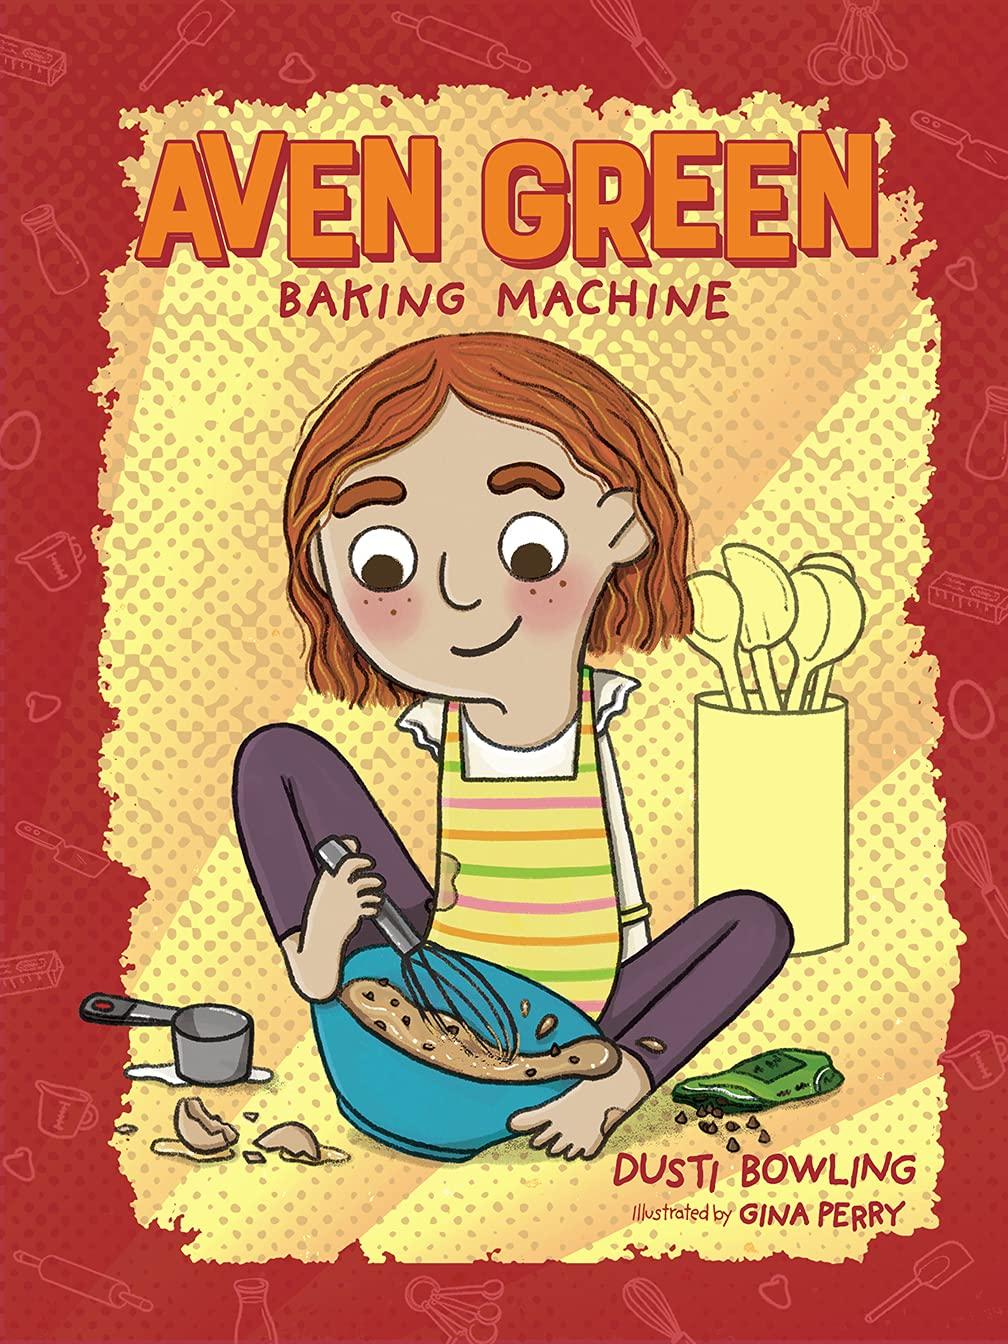 celebrate-picture-books-picture-book-review-aven-green-baking-machine-cover